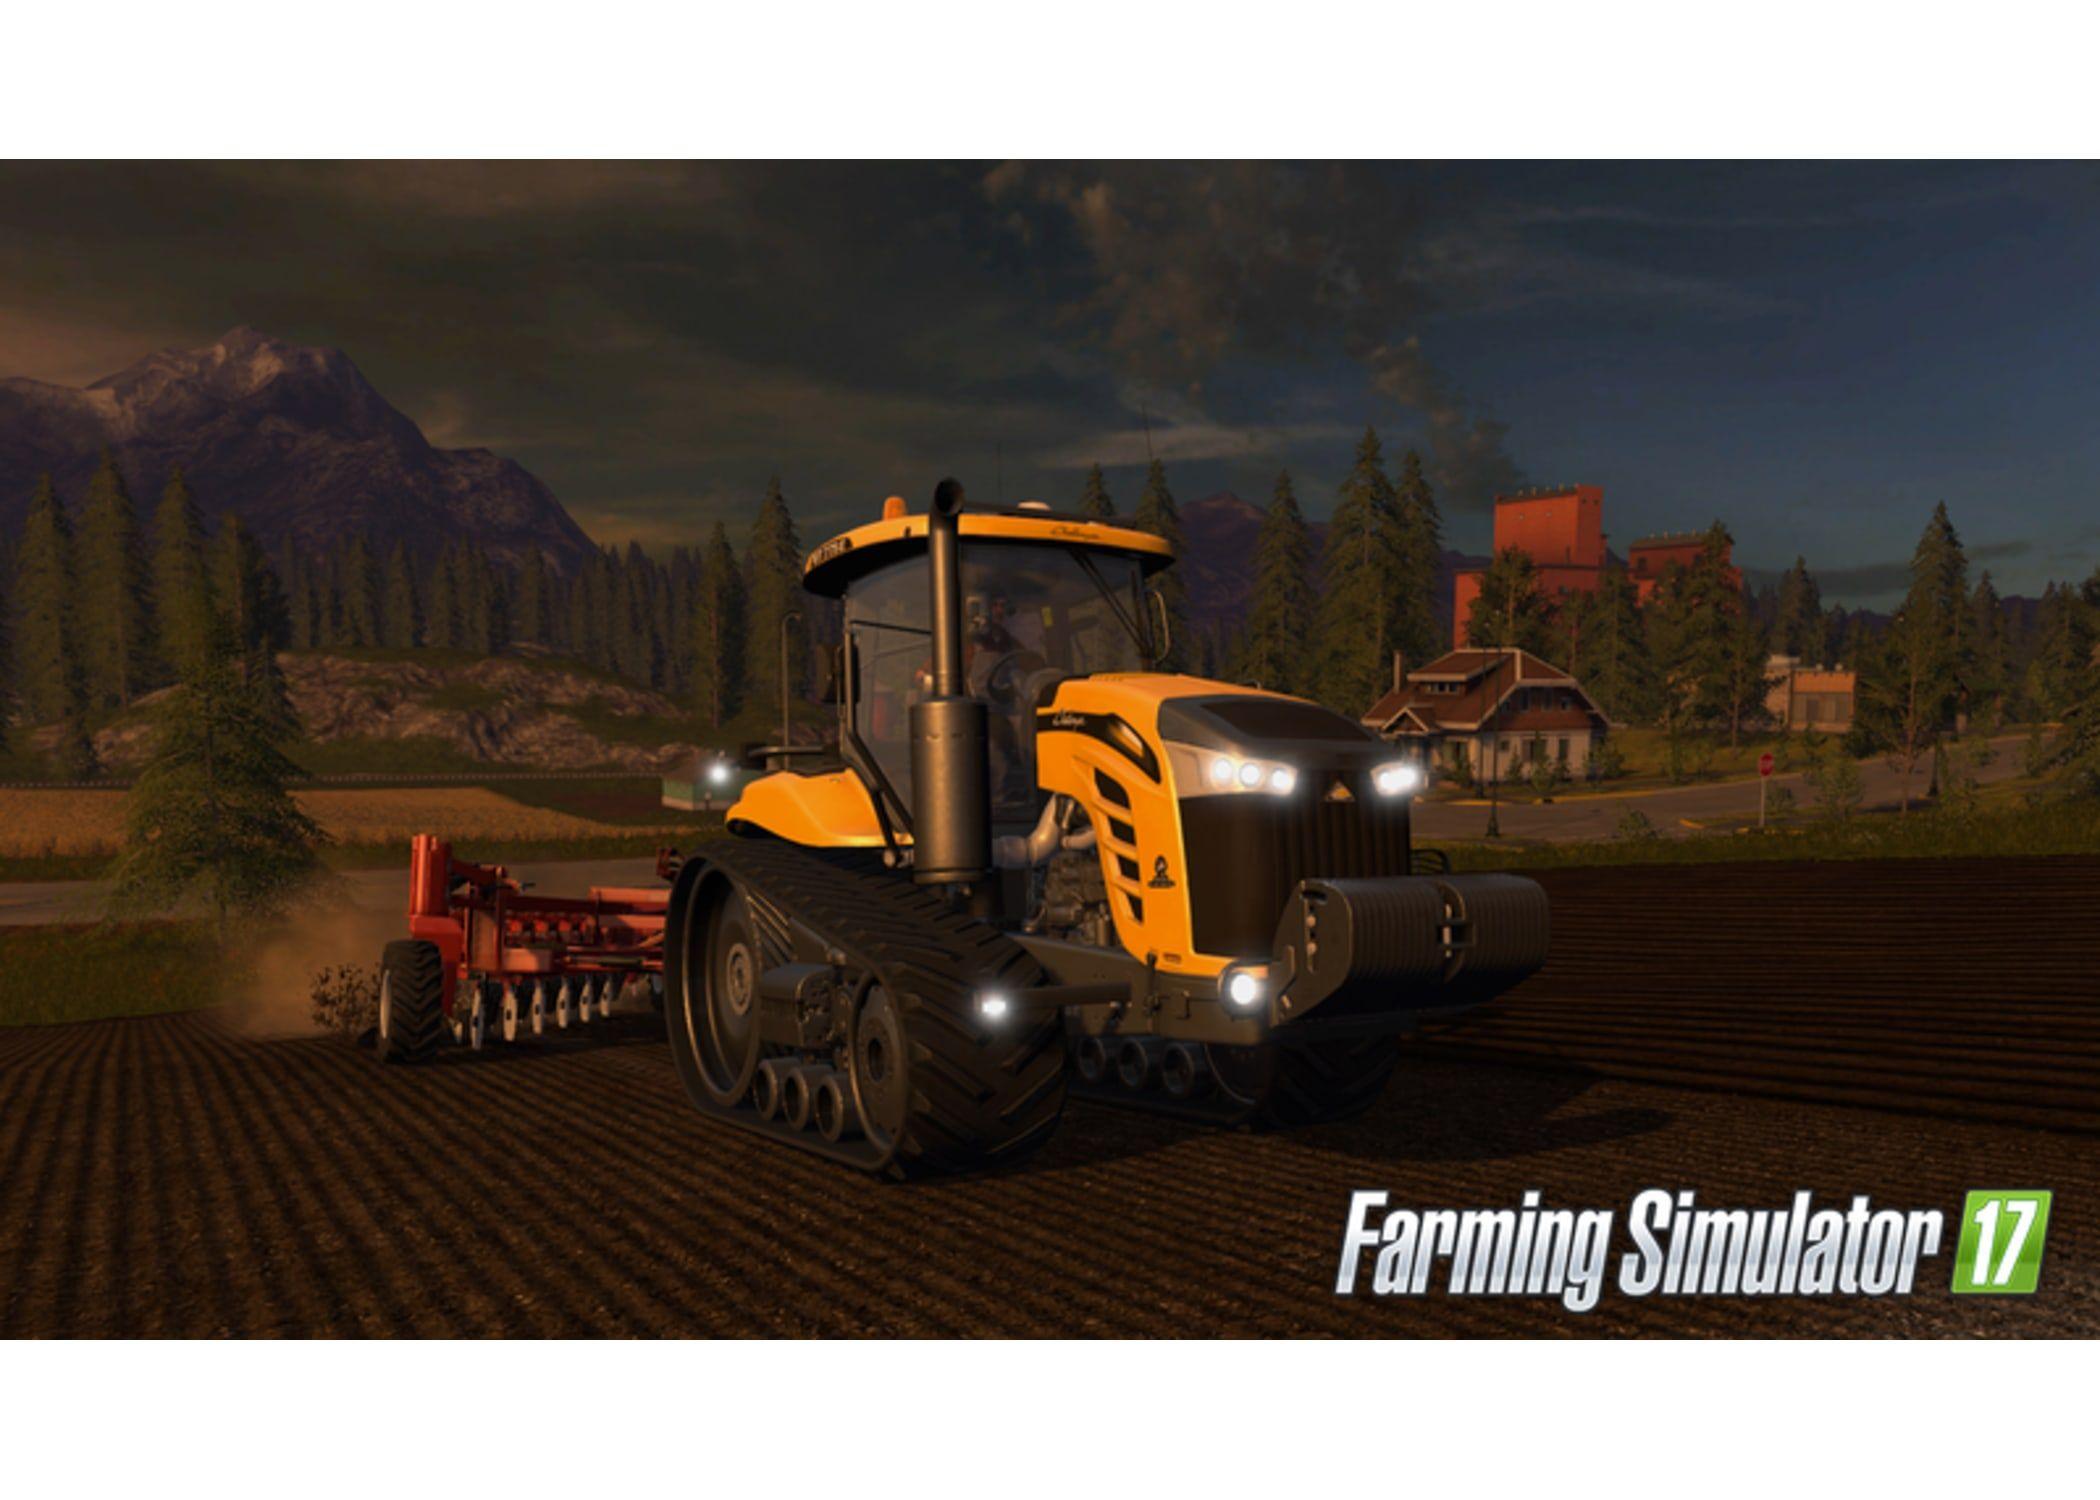 Farming Simulator 17 in 2020 Farming simulator, Art logo